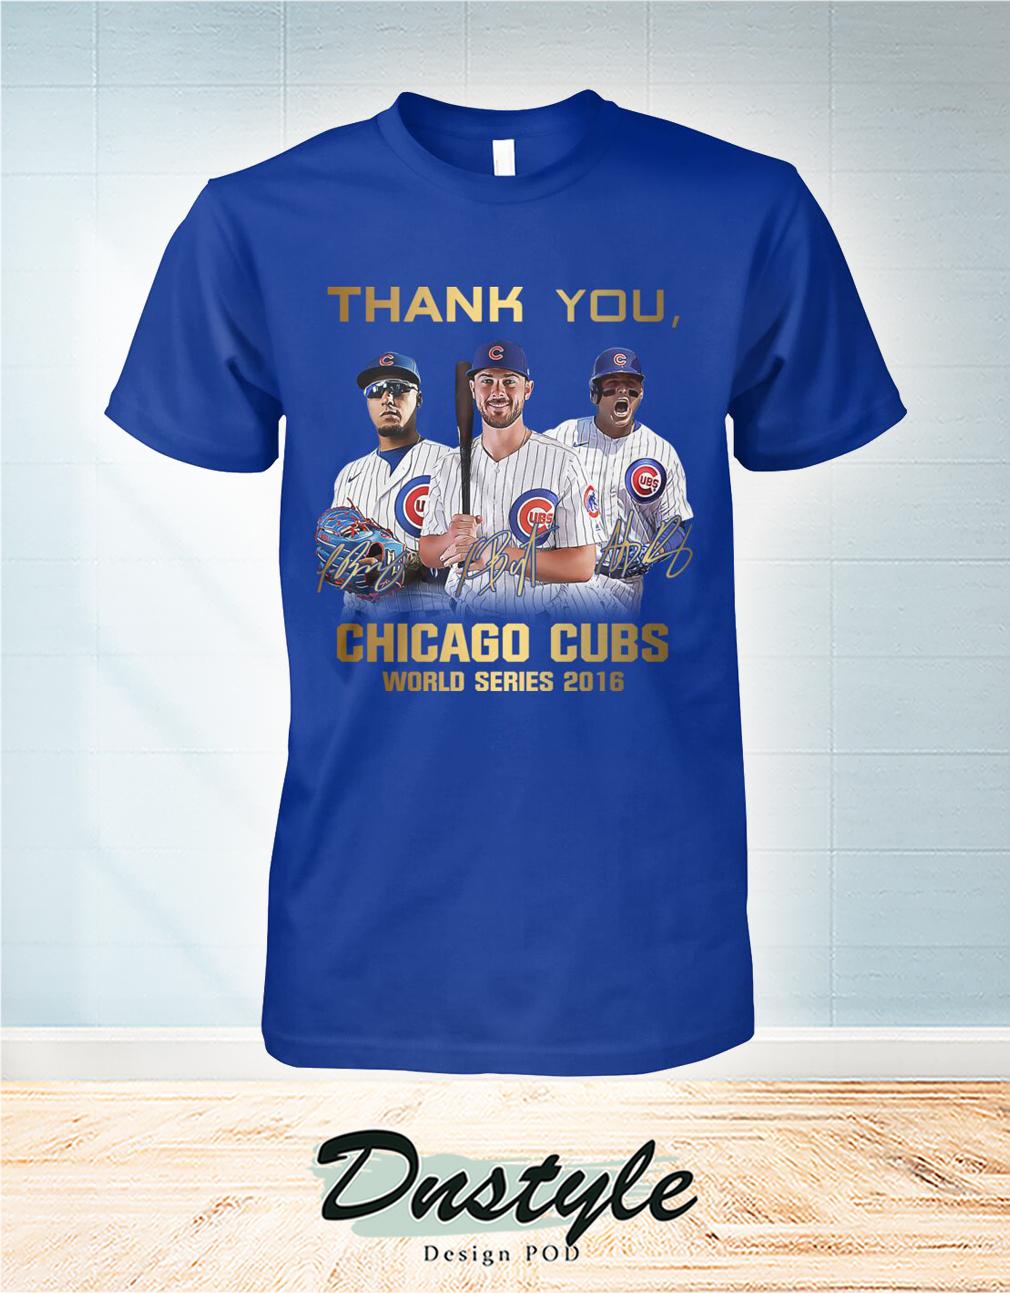 Thank you Chicago cubs world series 2016 shirt